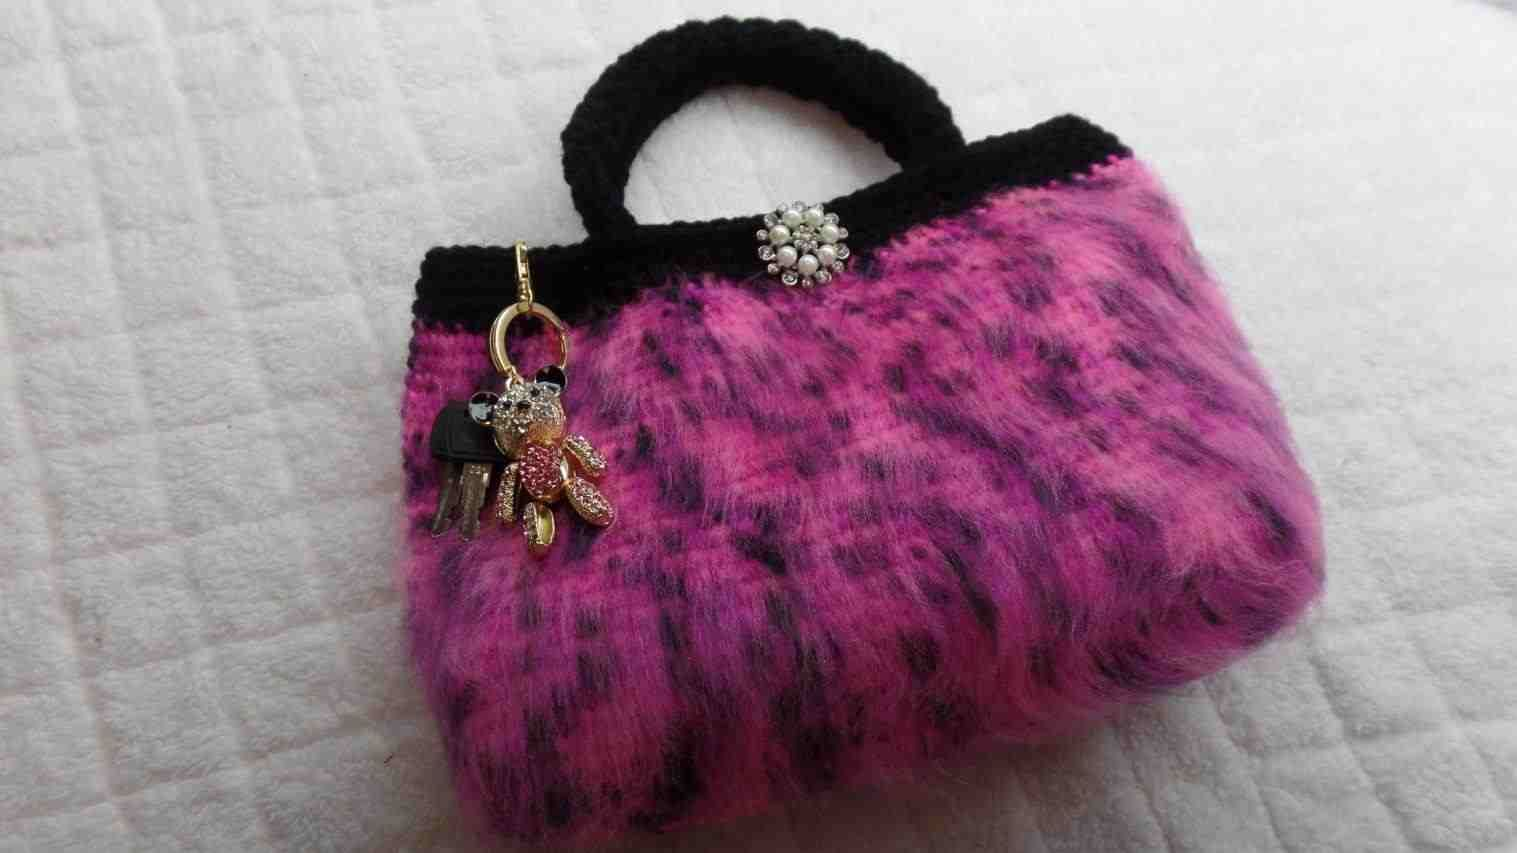 Tutorial Crochet Bag Crochet Baby Hello Kitty Purse Click Here To